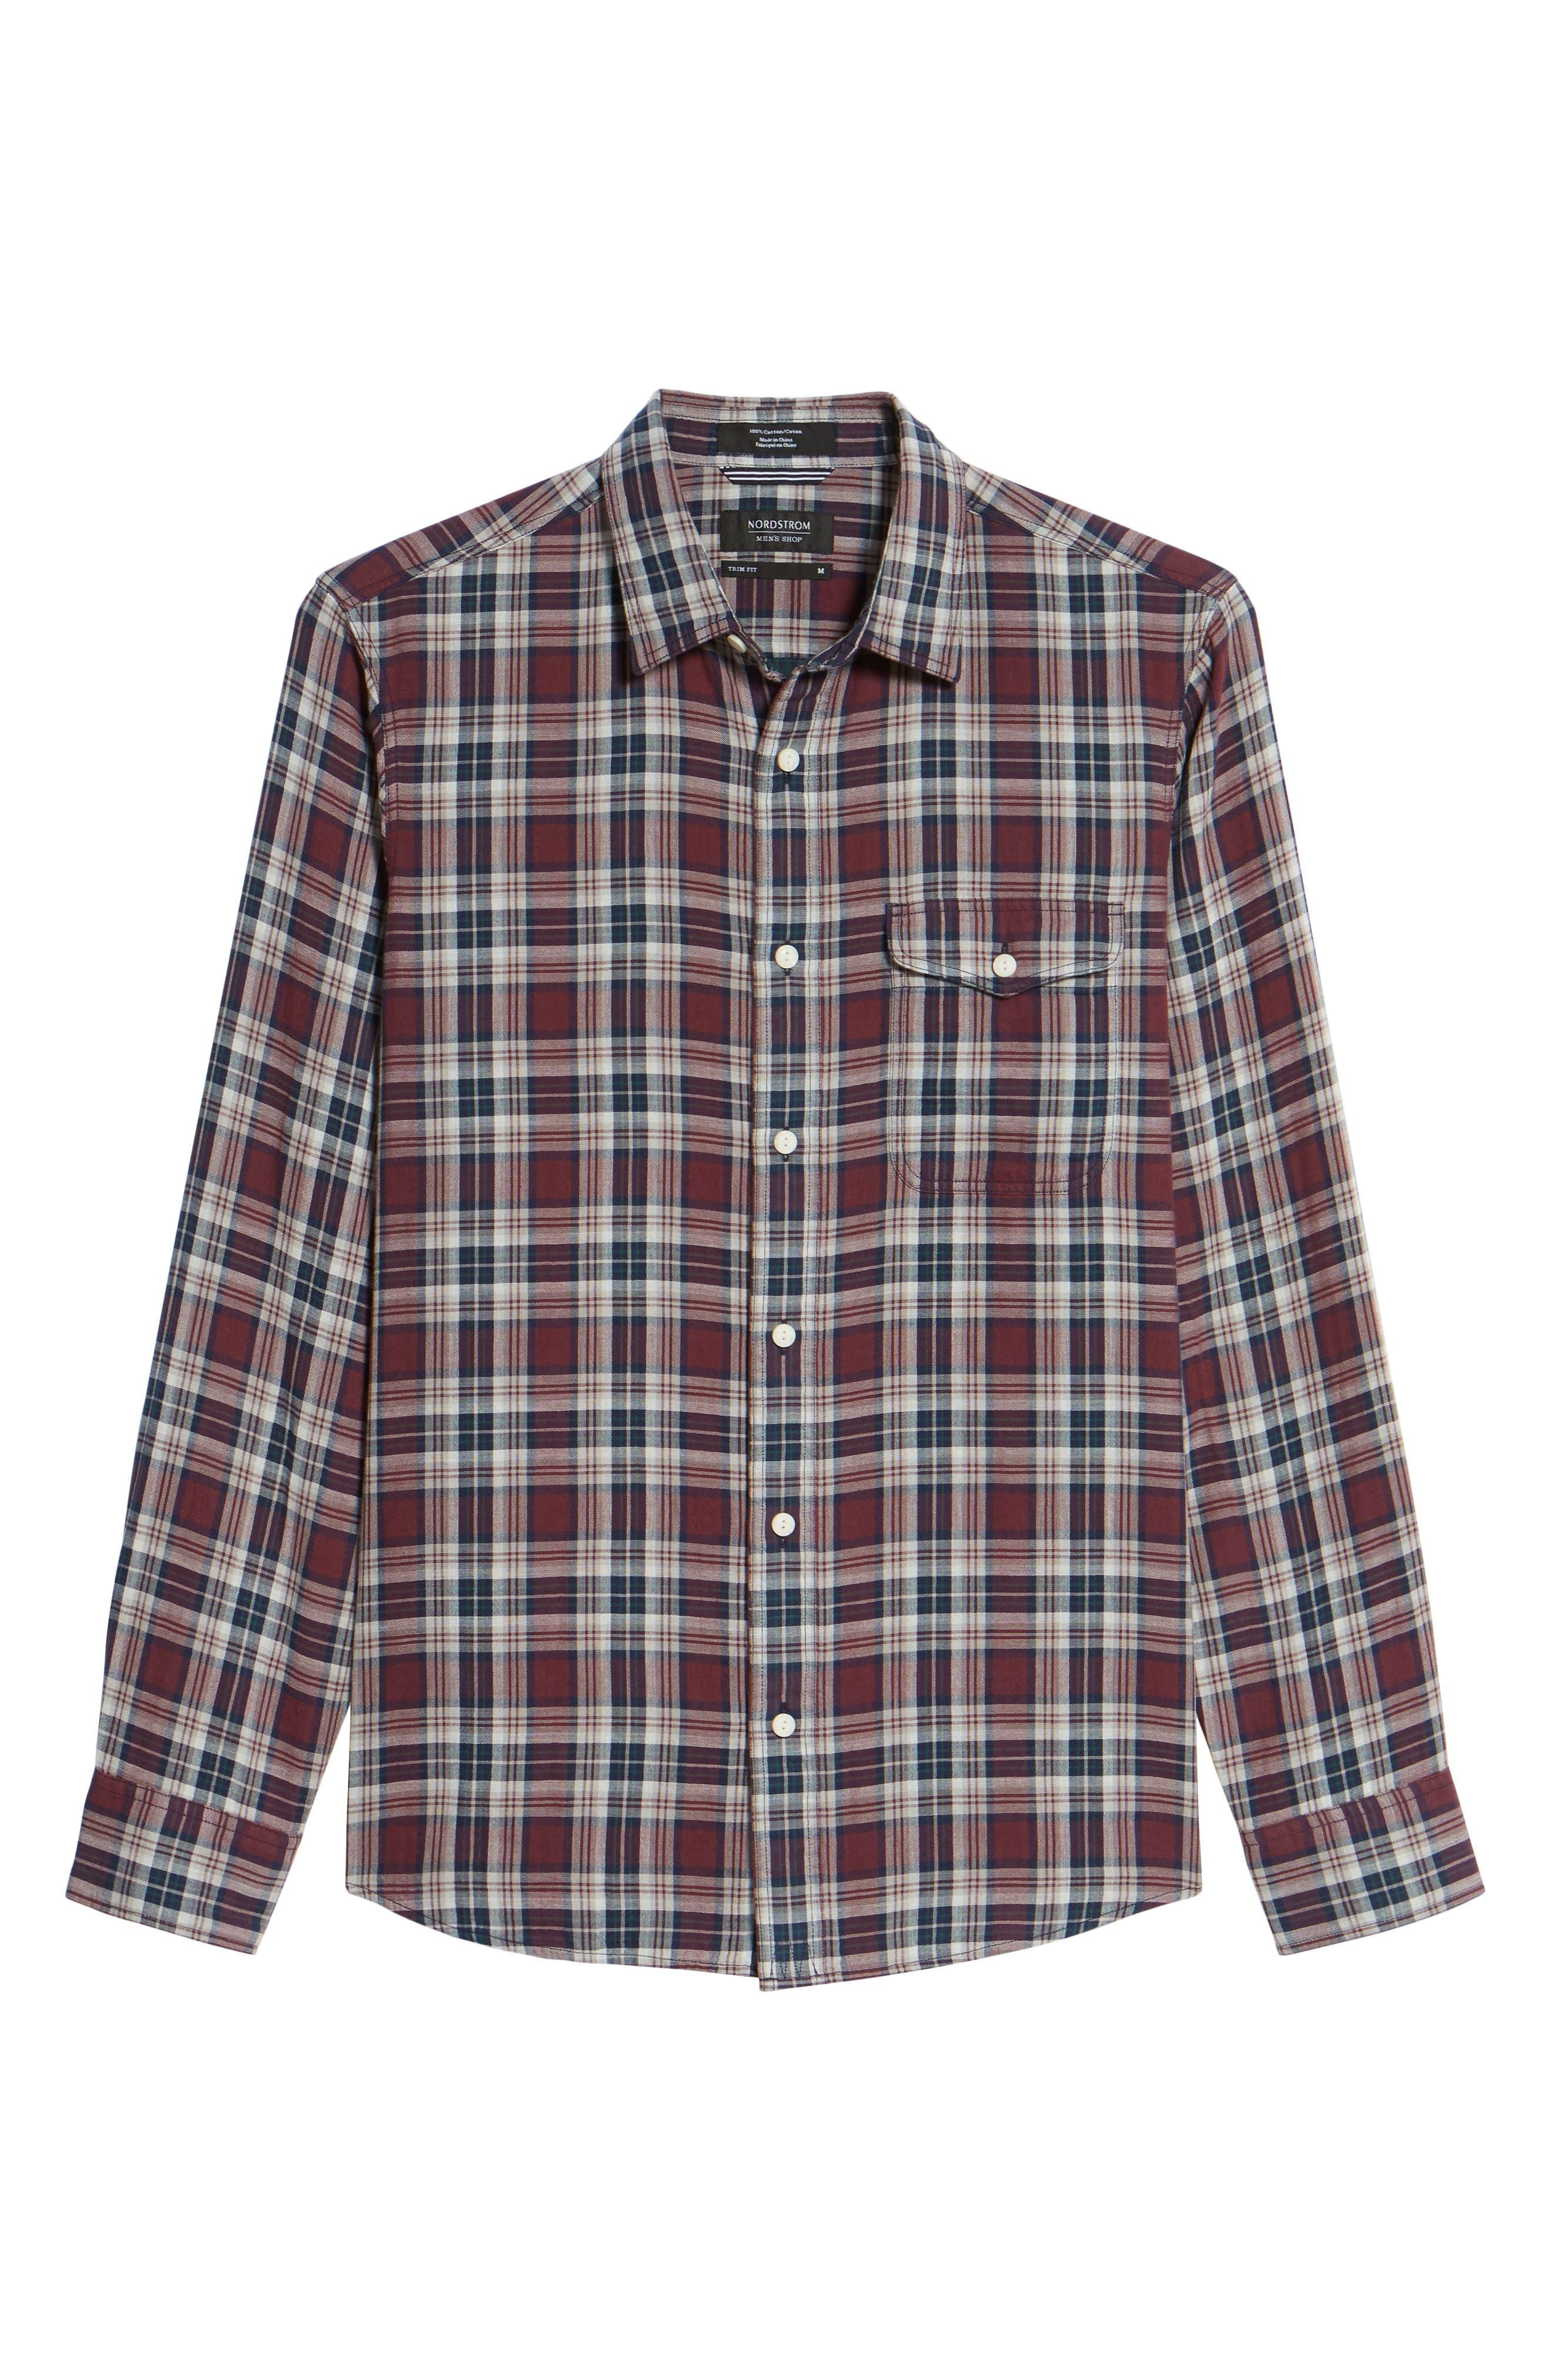 Lumber Duofold Slim Fit Plaid Shirt,                             Alternate thumbnail 6, color,                             938